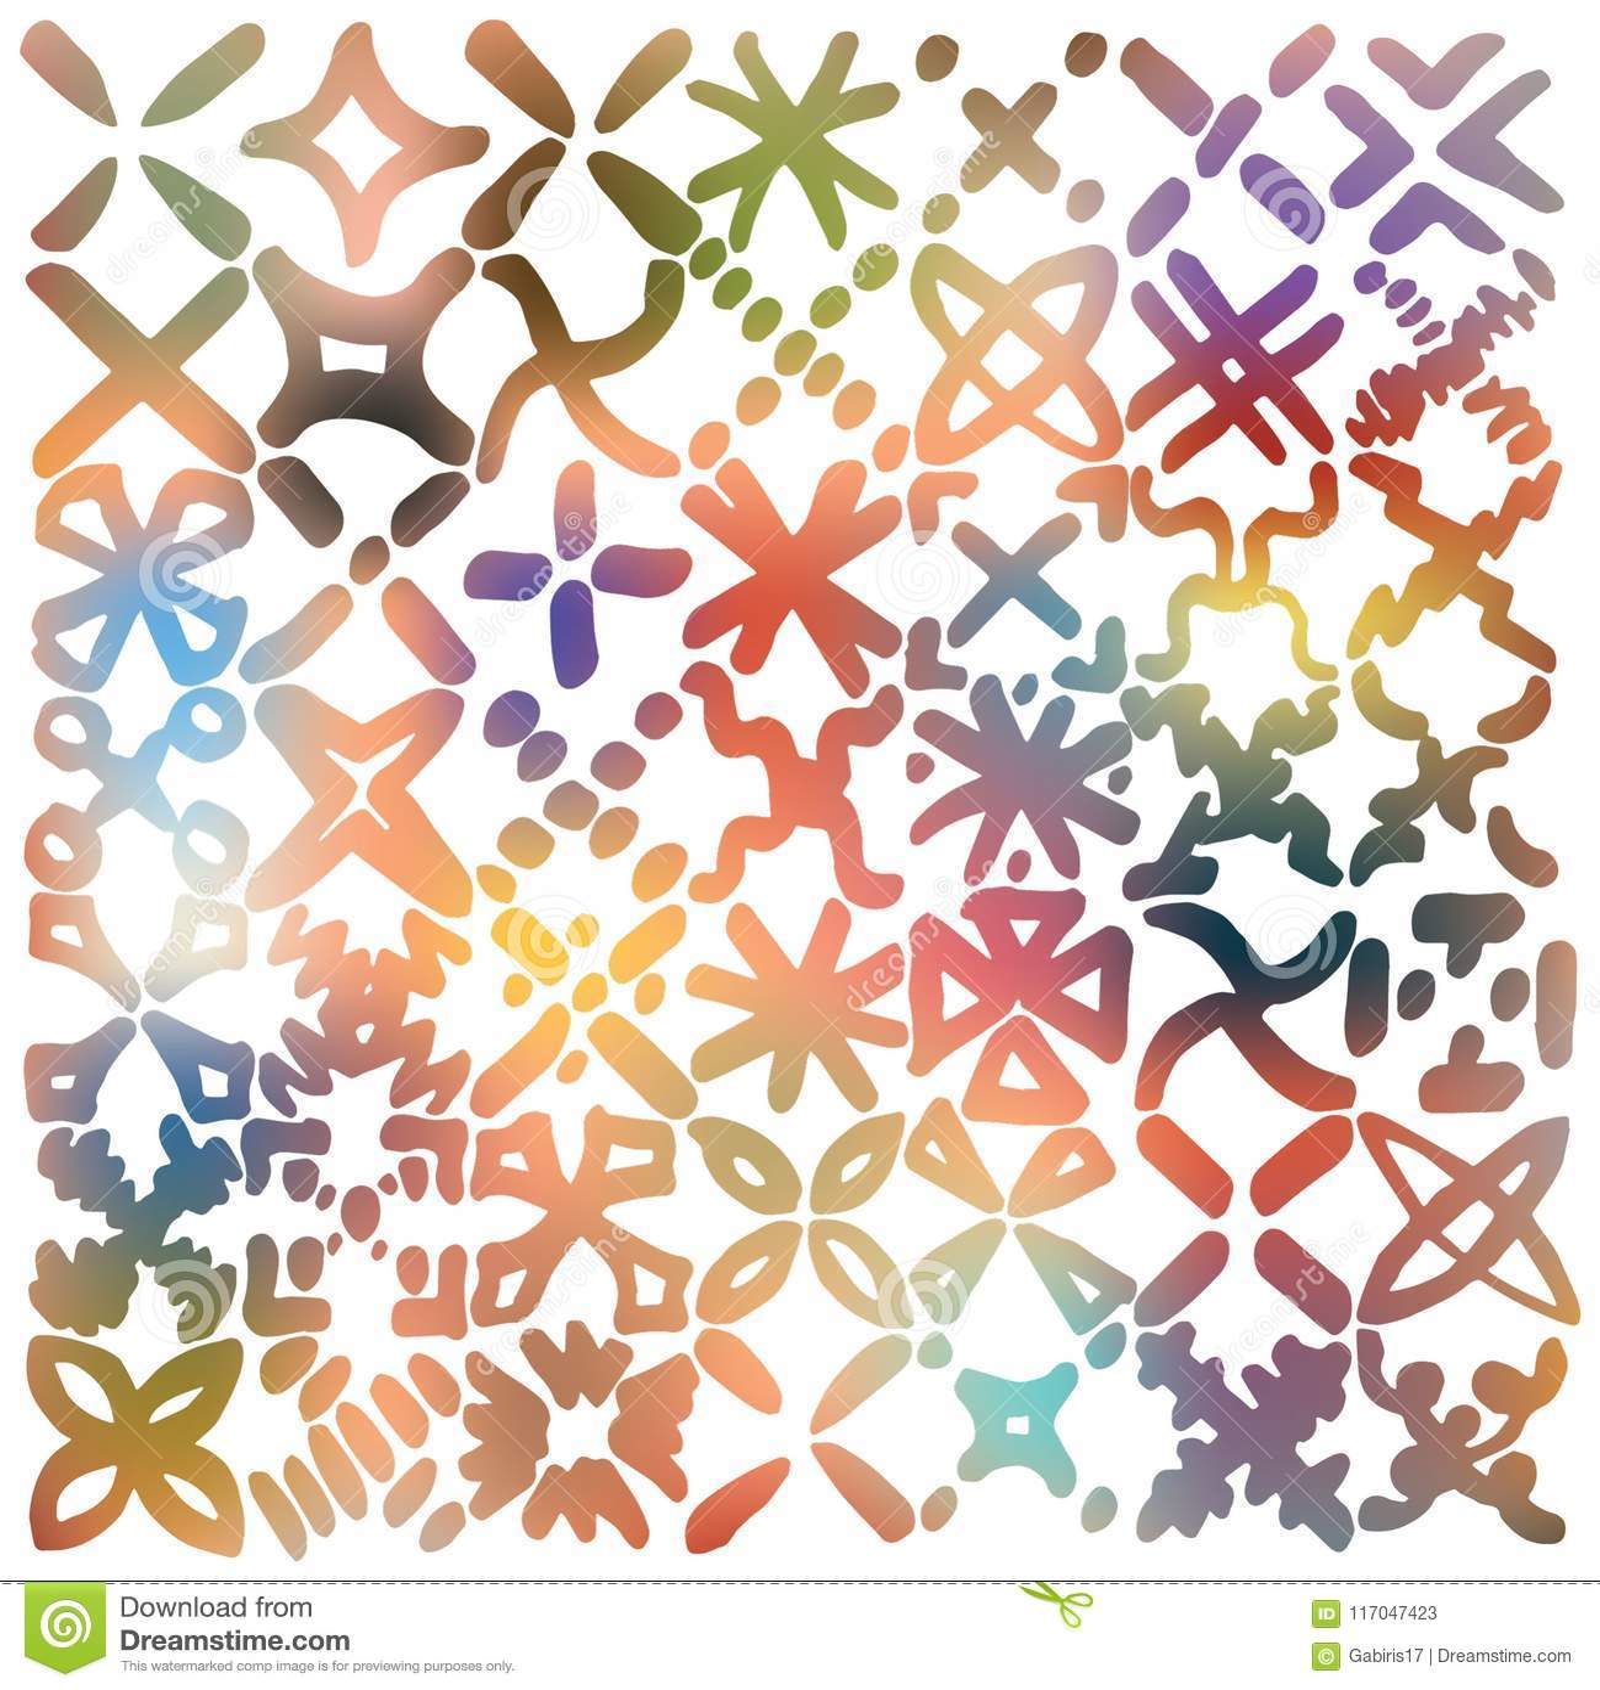 gradual shade filled x marks grid made up of hand drawn marker